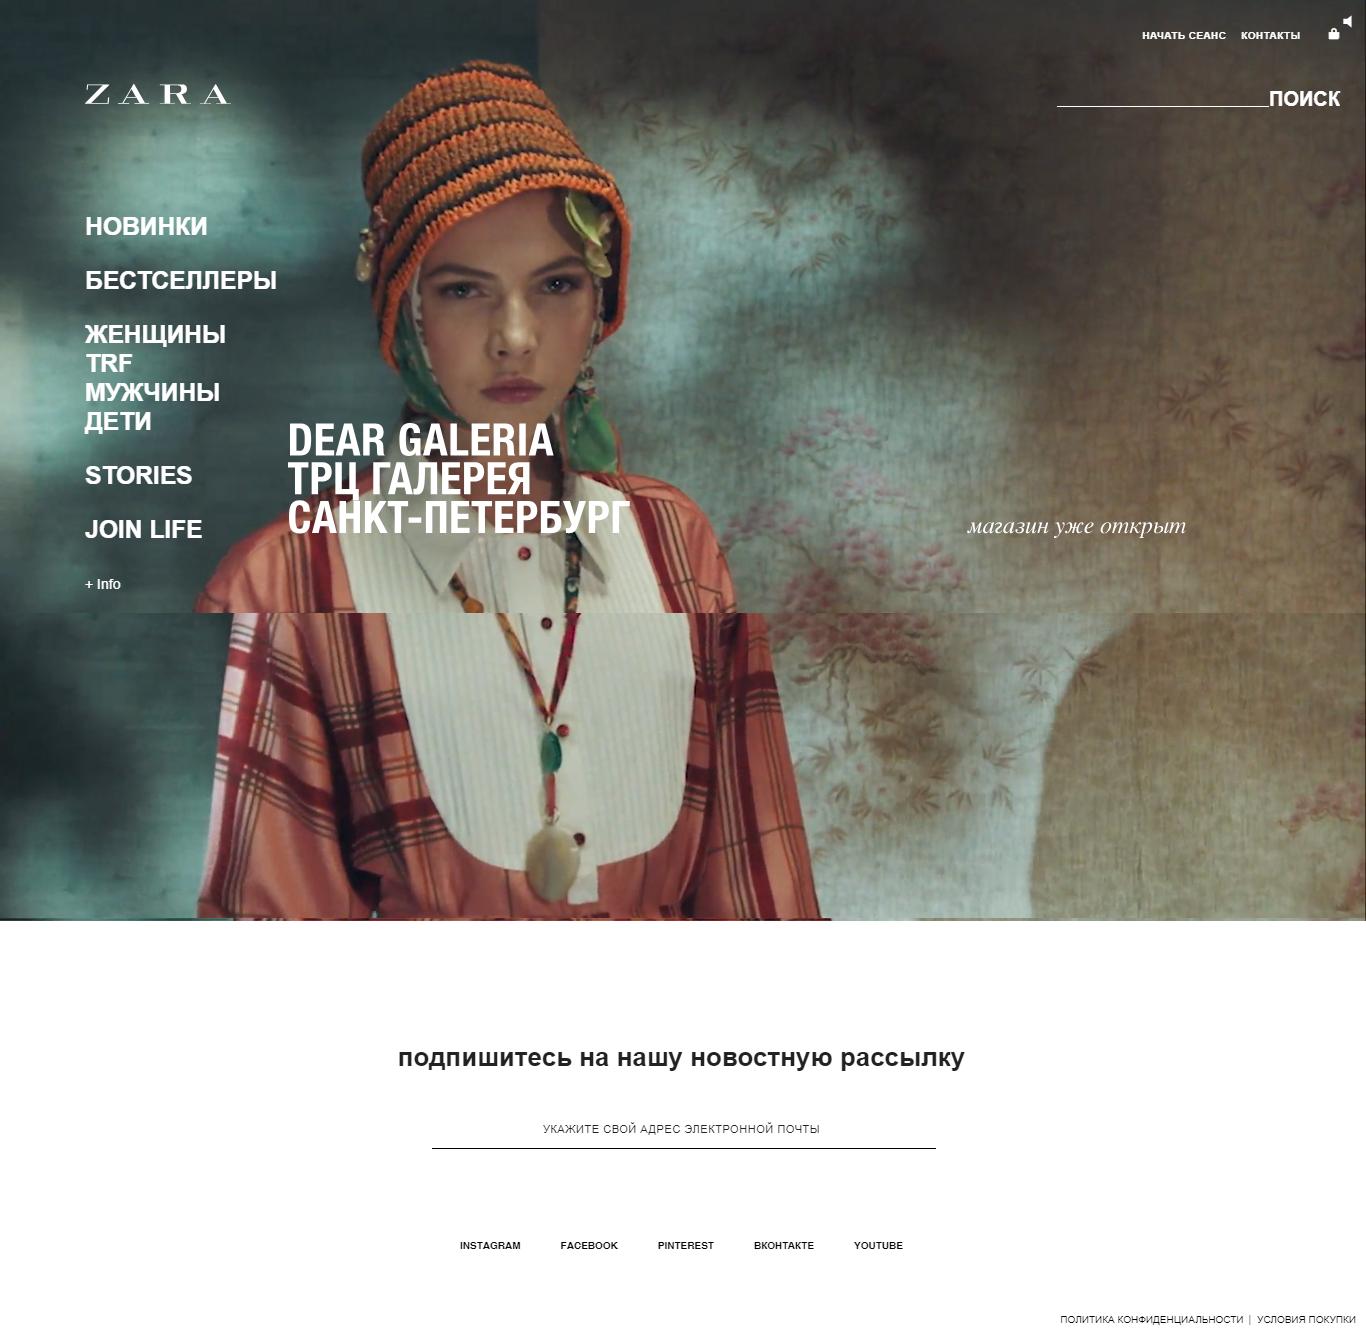 Zara homepage